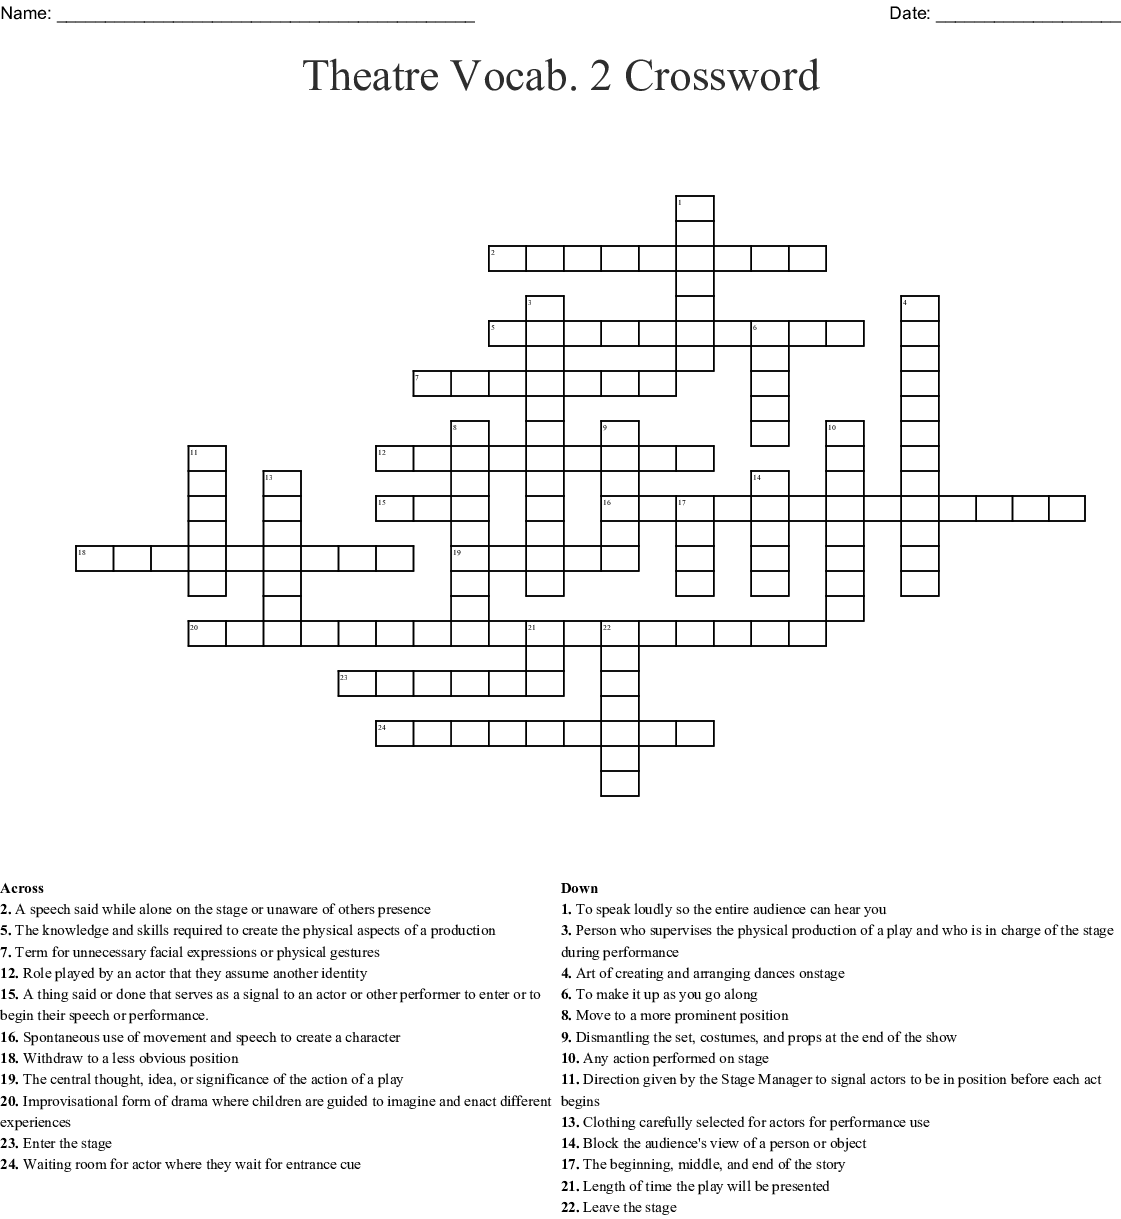 Theatre Vocab Crossword Puzzle Wordmint